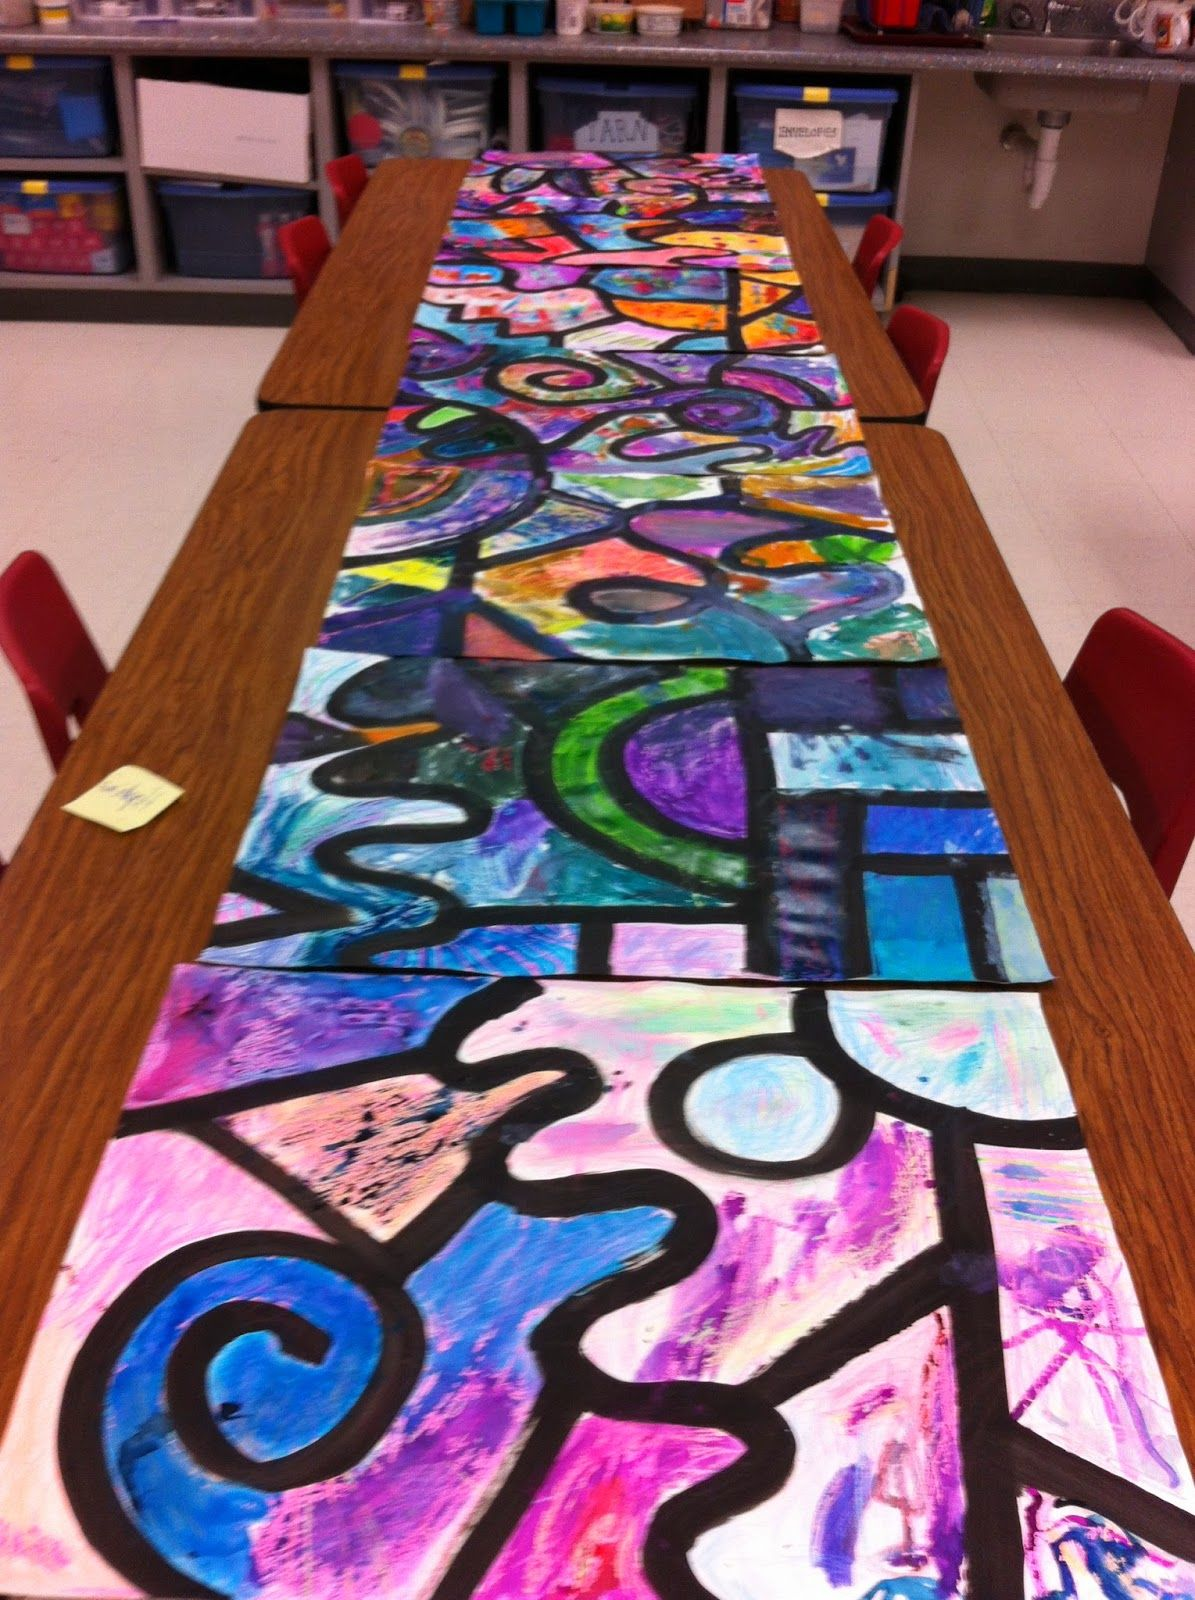 Collaborative Kinder Watercolor Resist Painting Problem